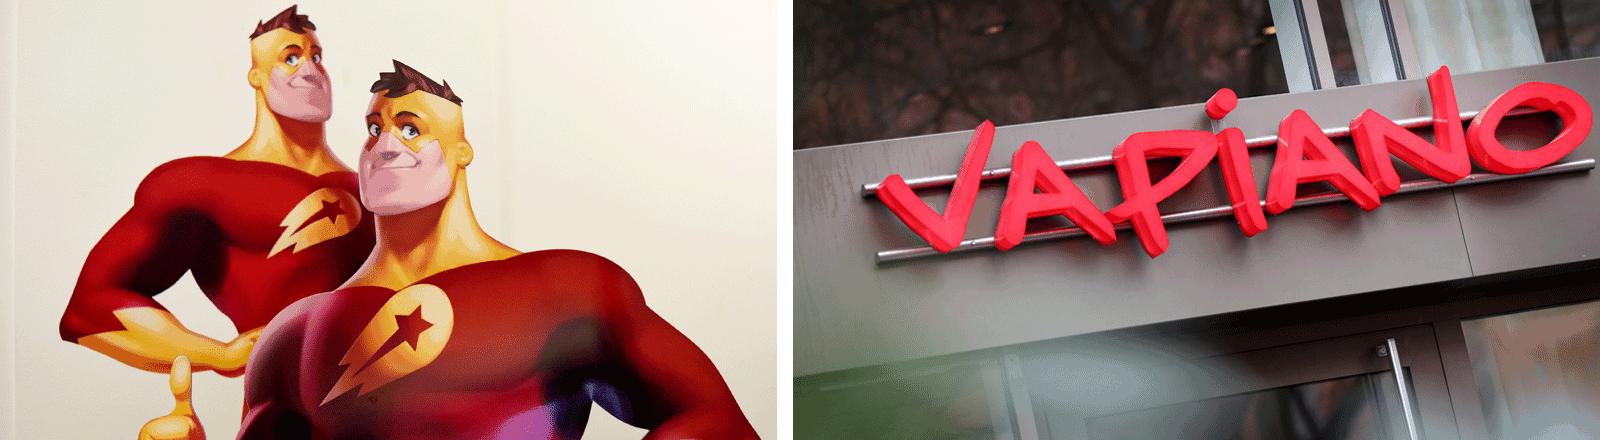 Vapiano und Delivery Hero